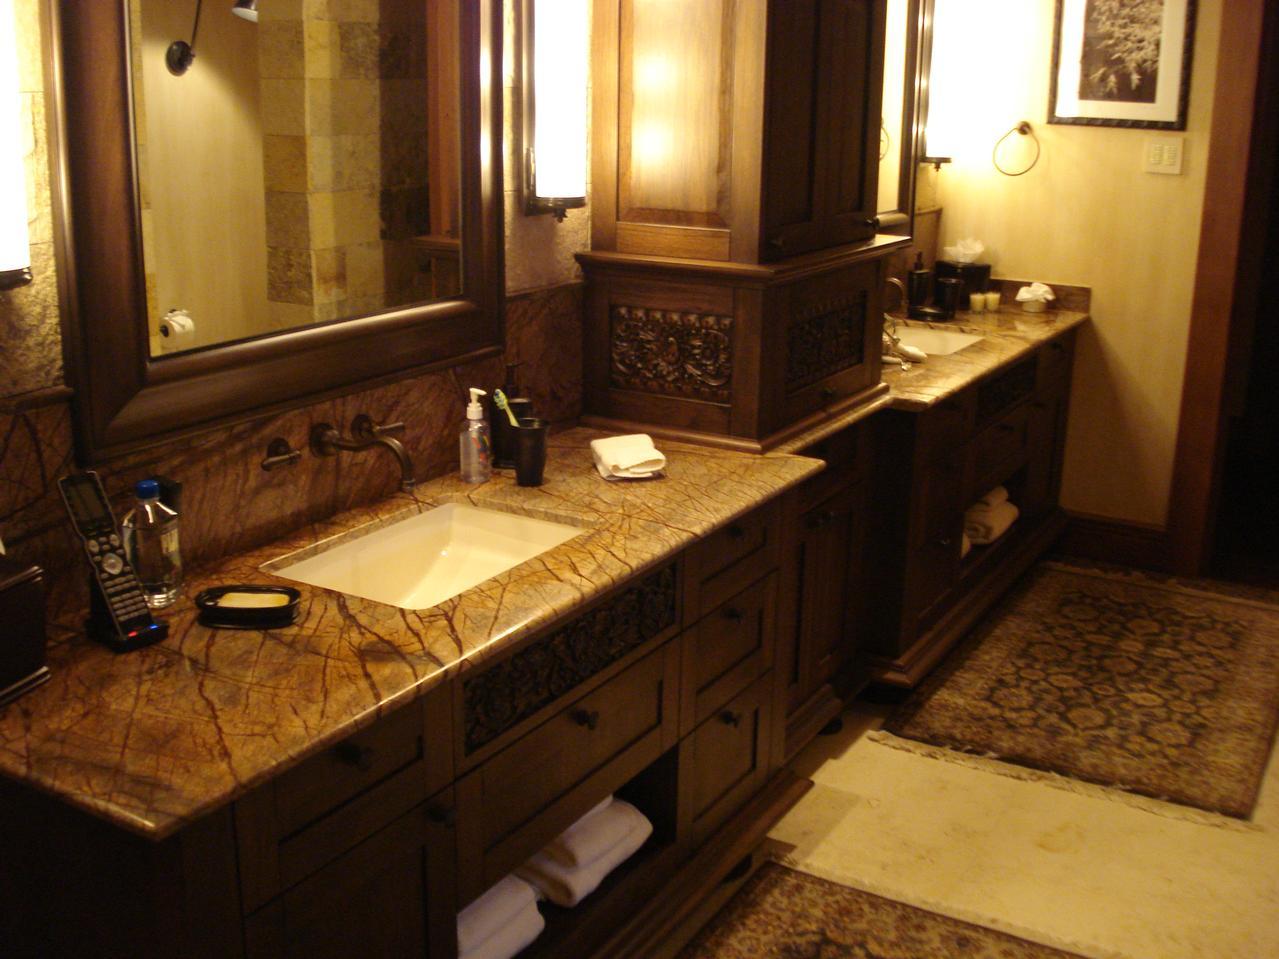 32 Interesting Bathroom Countertop Granite Tile Picture